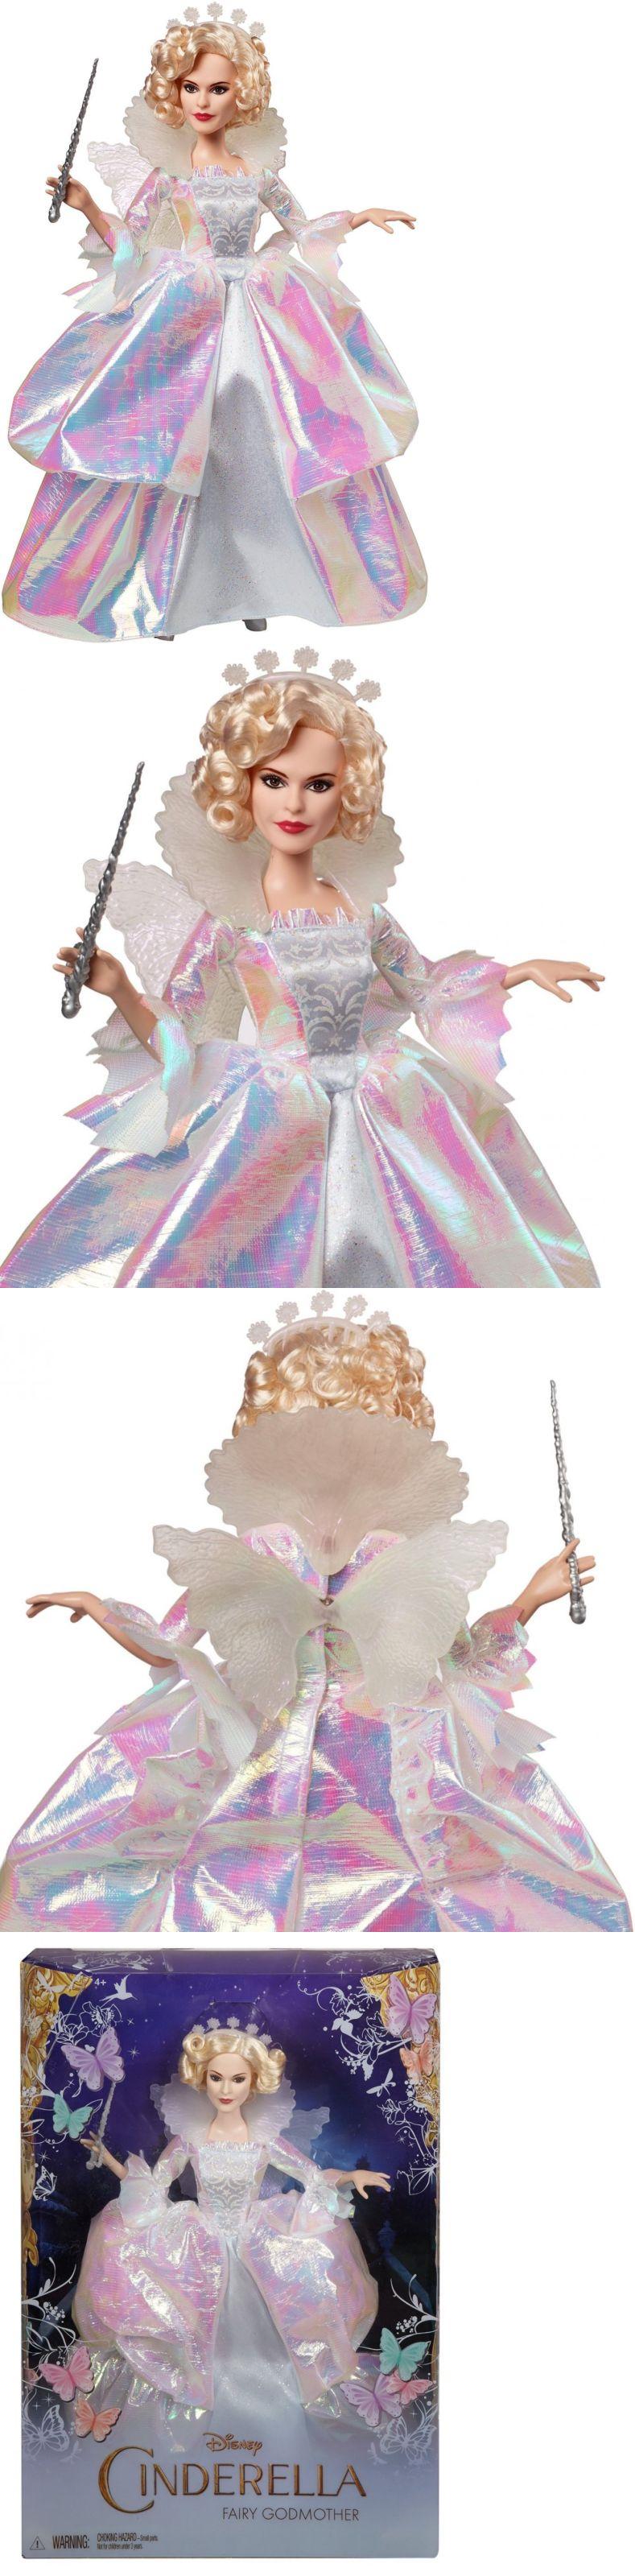 Cinderella wedding dress disney store  Cinderella  Disney Cinderella Fairy Godmother Doll ue BUY IT